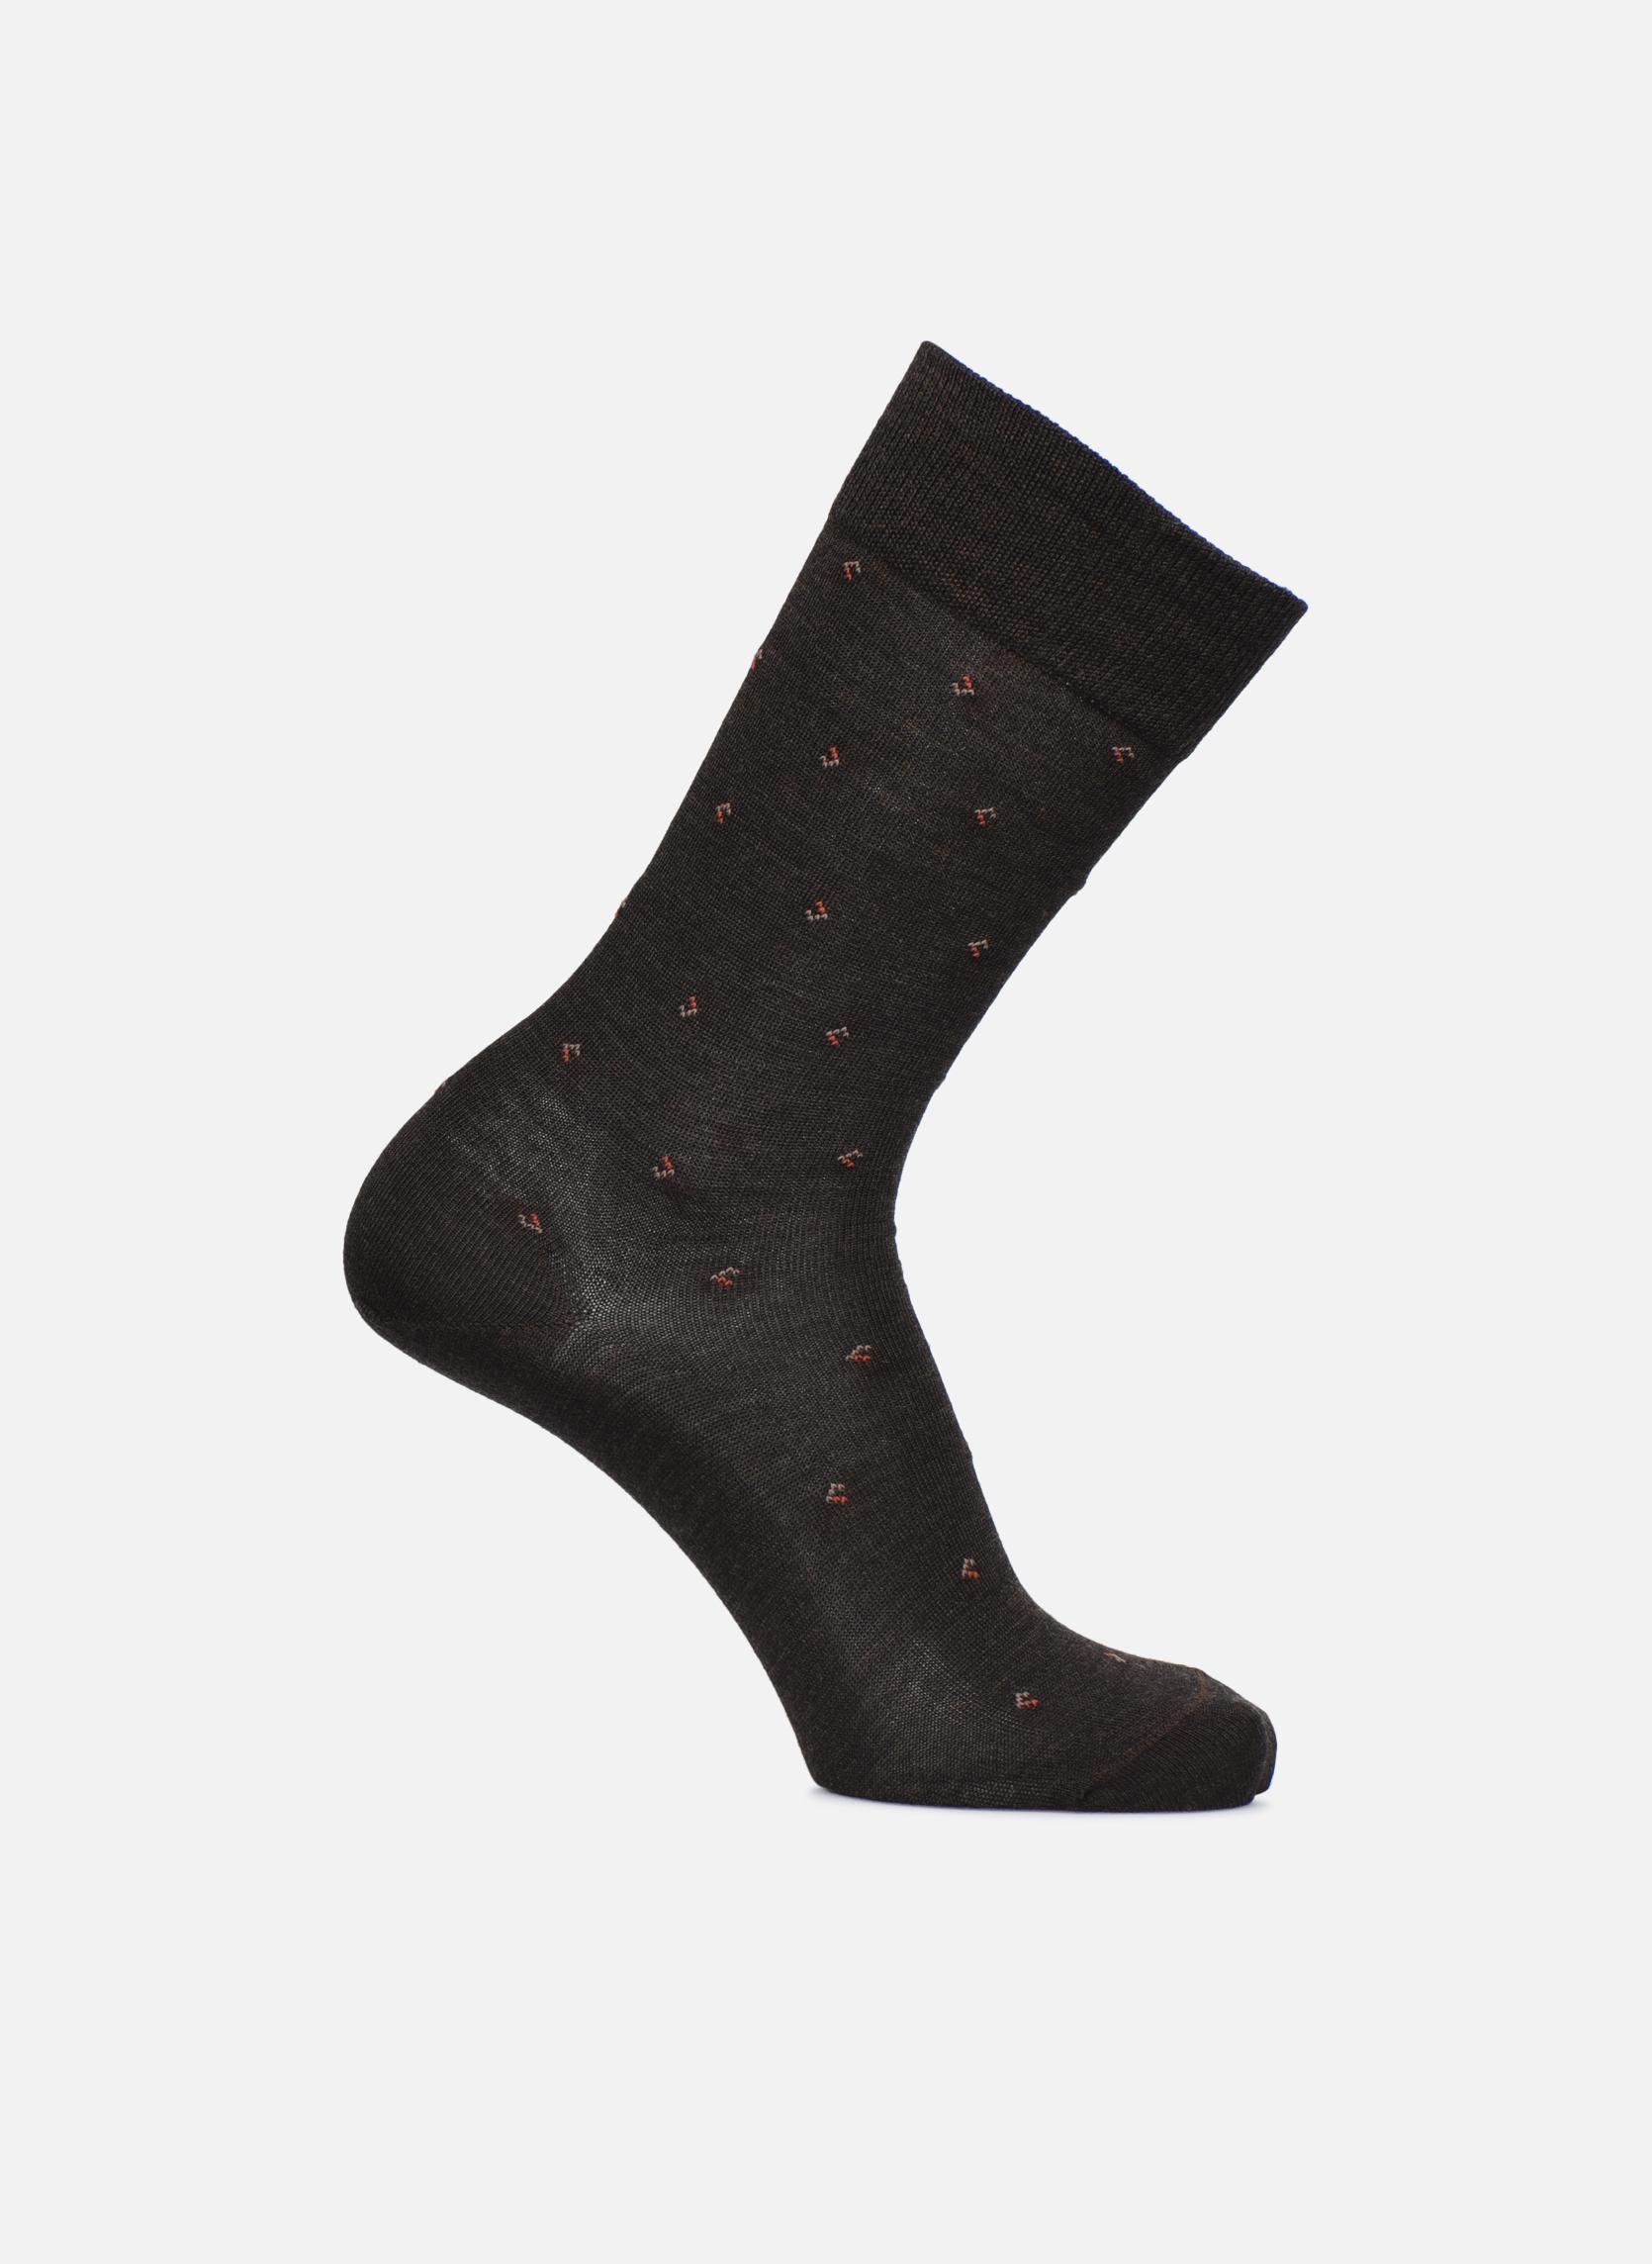 Socken & Strumpfhosen Accessoires Socken Losanges